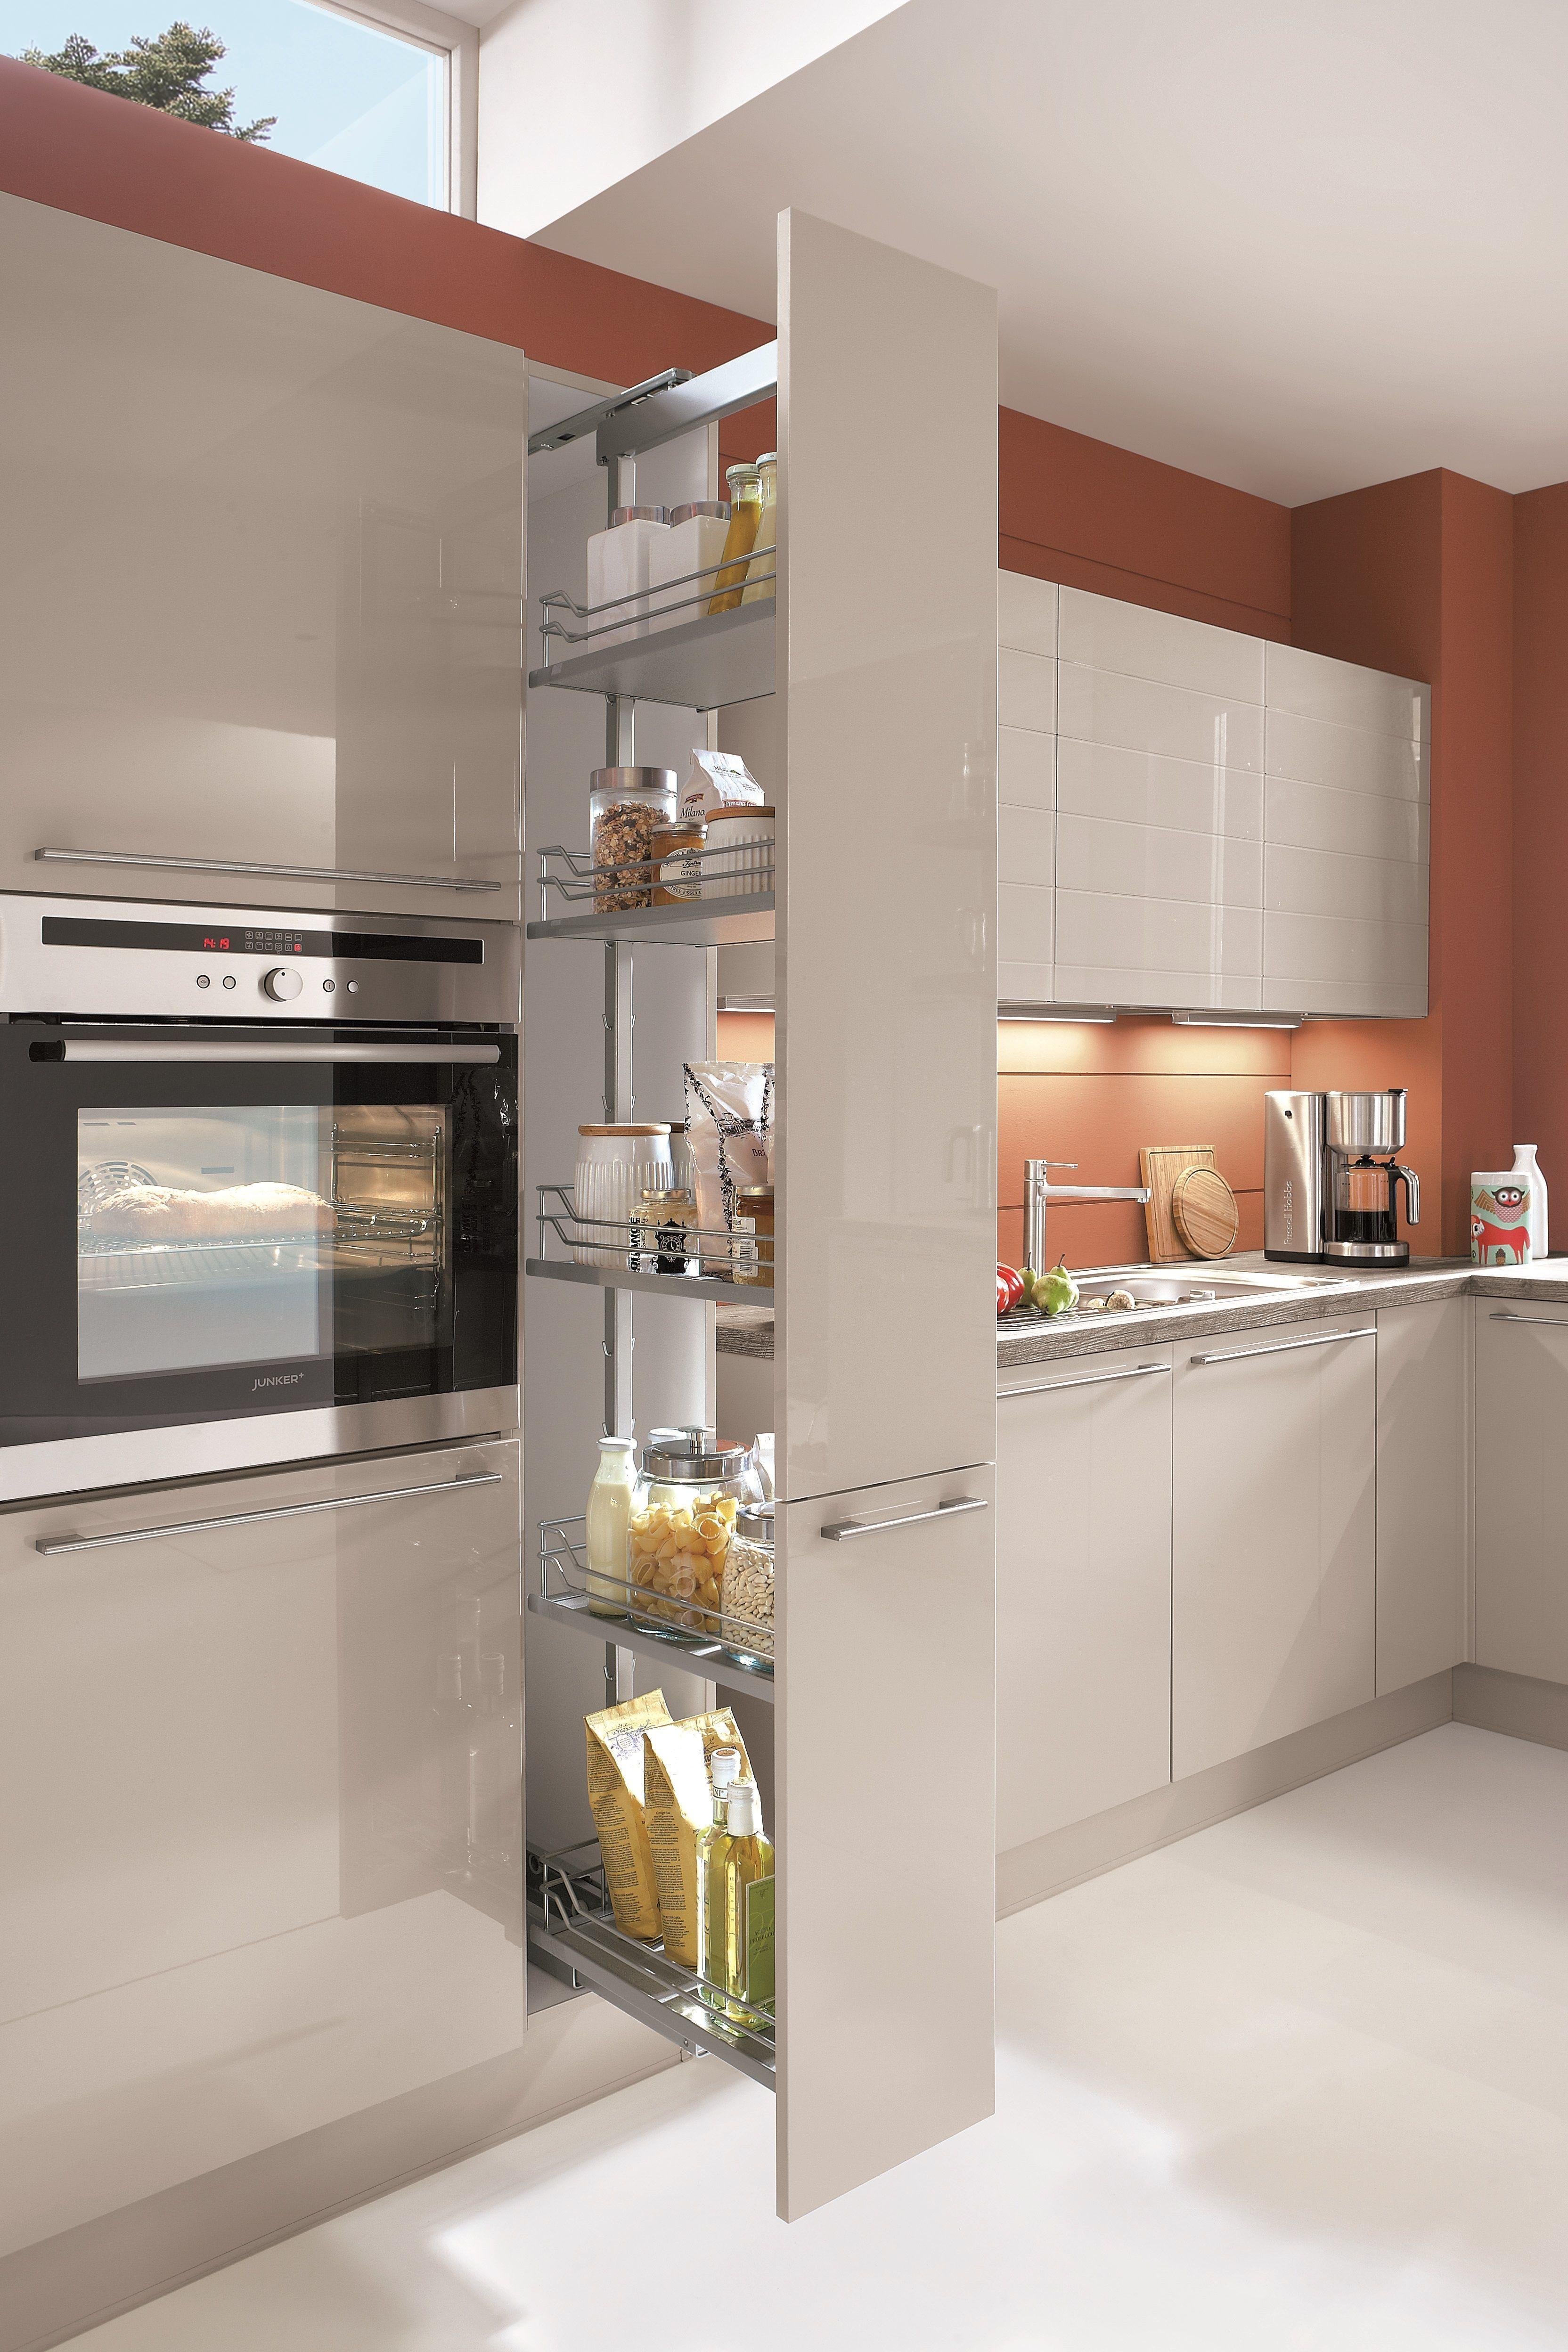 el color del muebleee in 2020 Kitchen room design